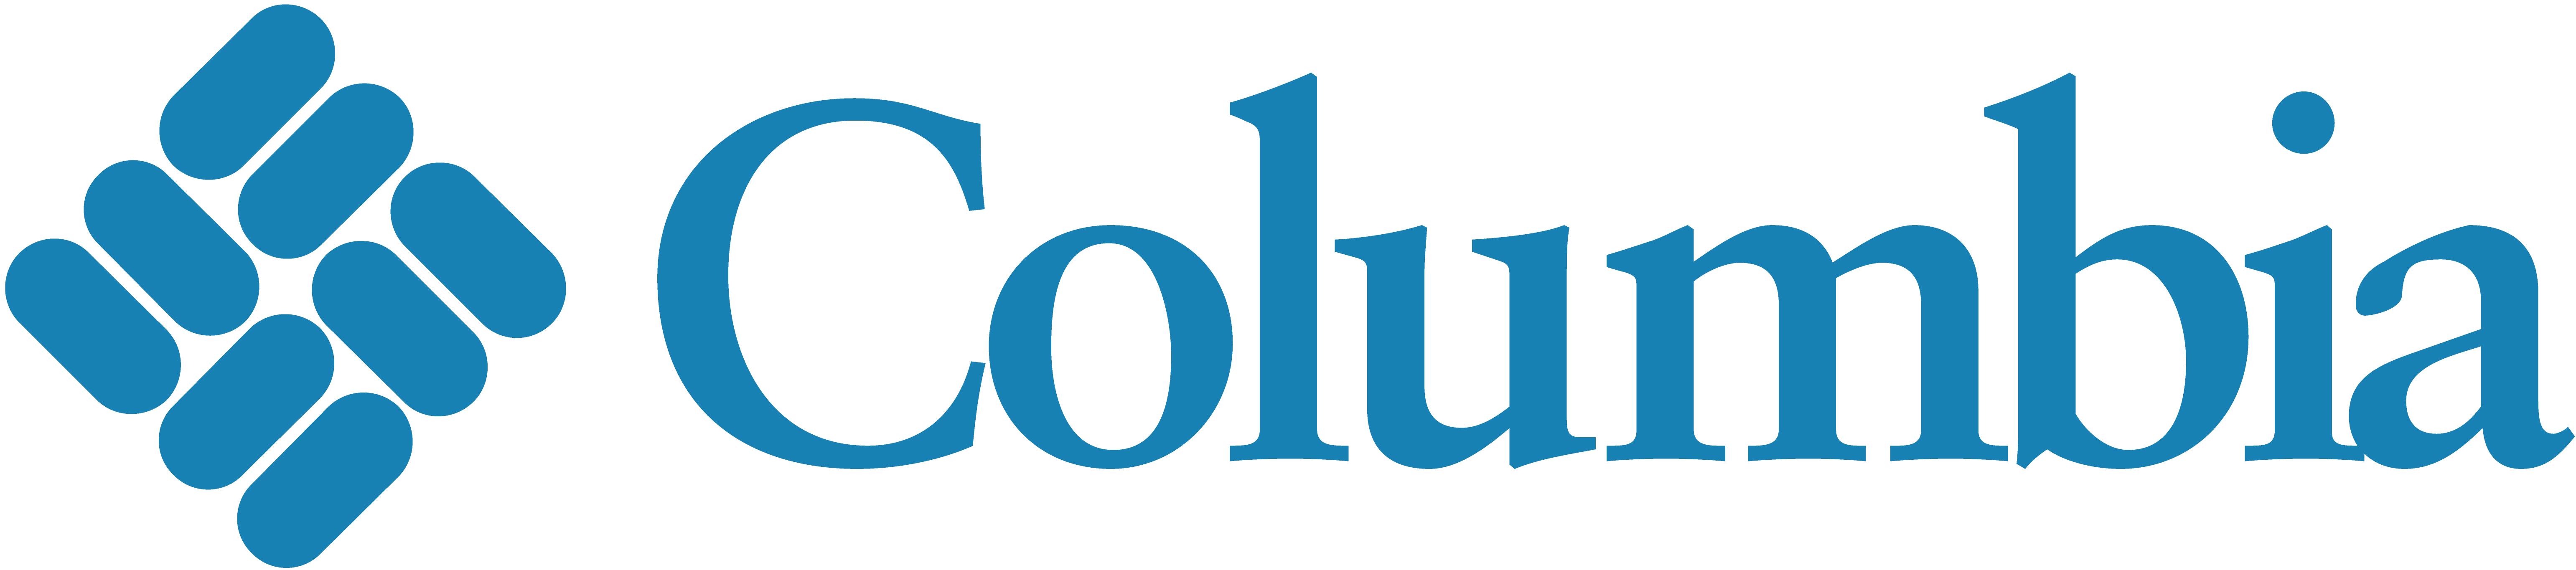 columbia-logo.jpeg